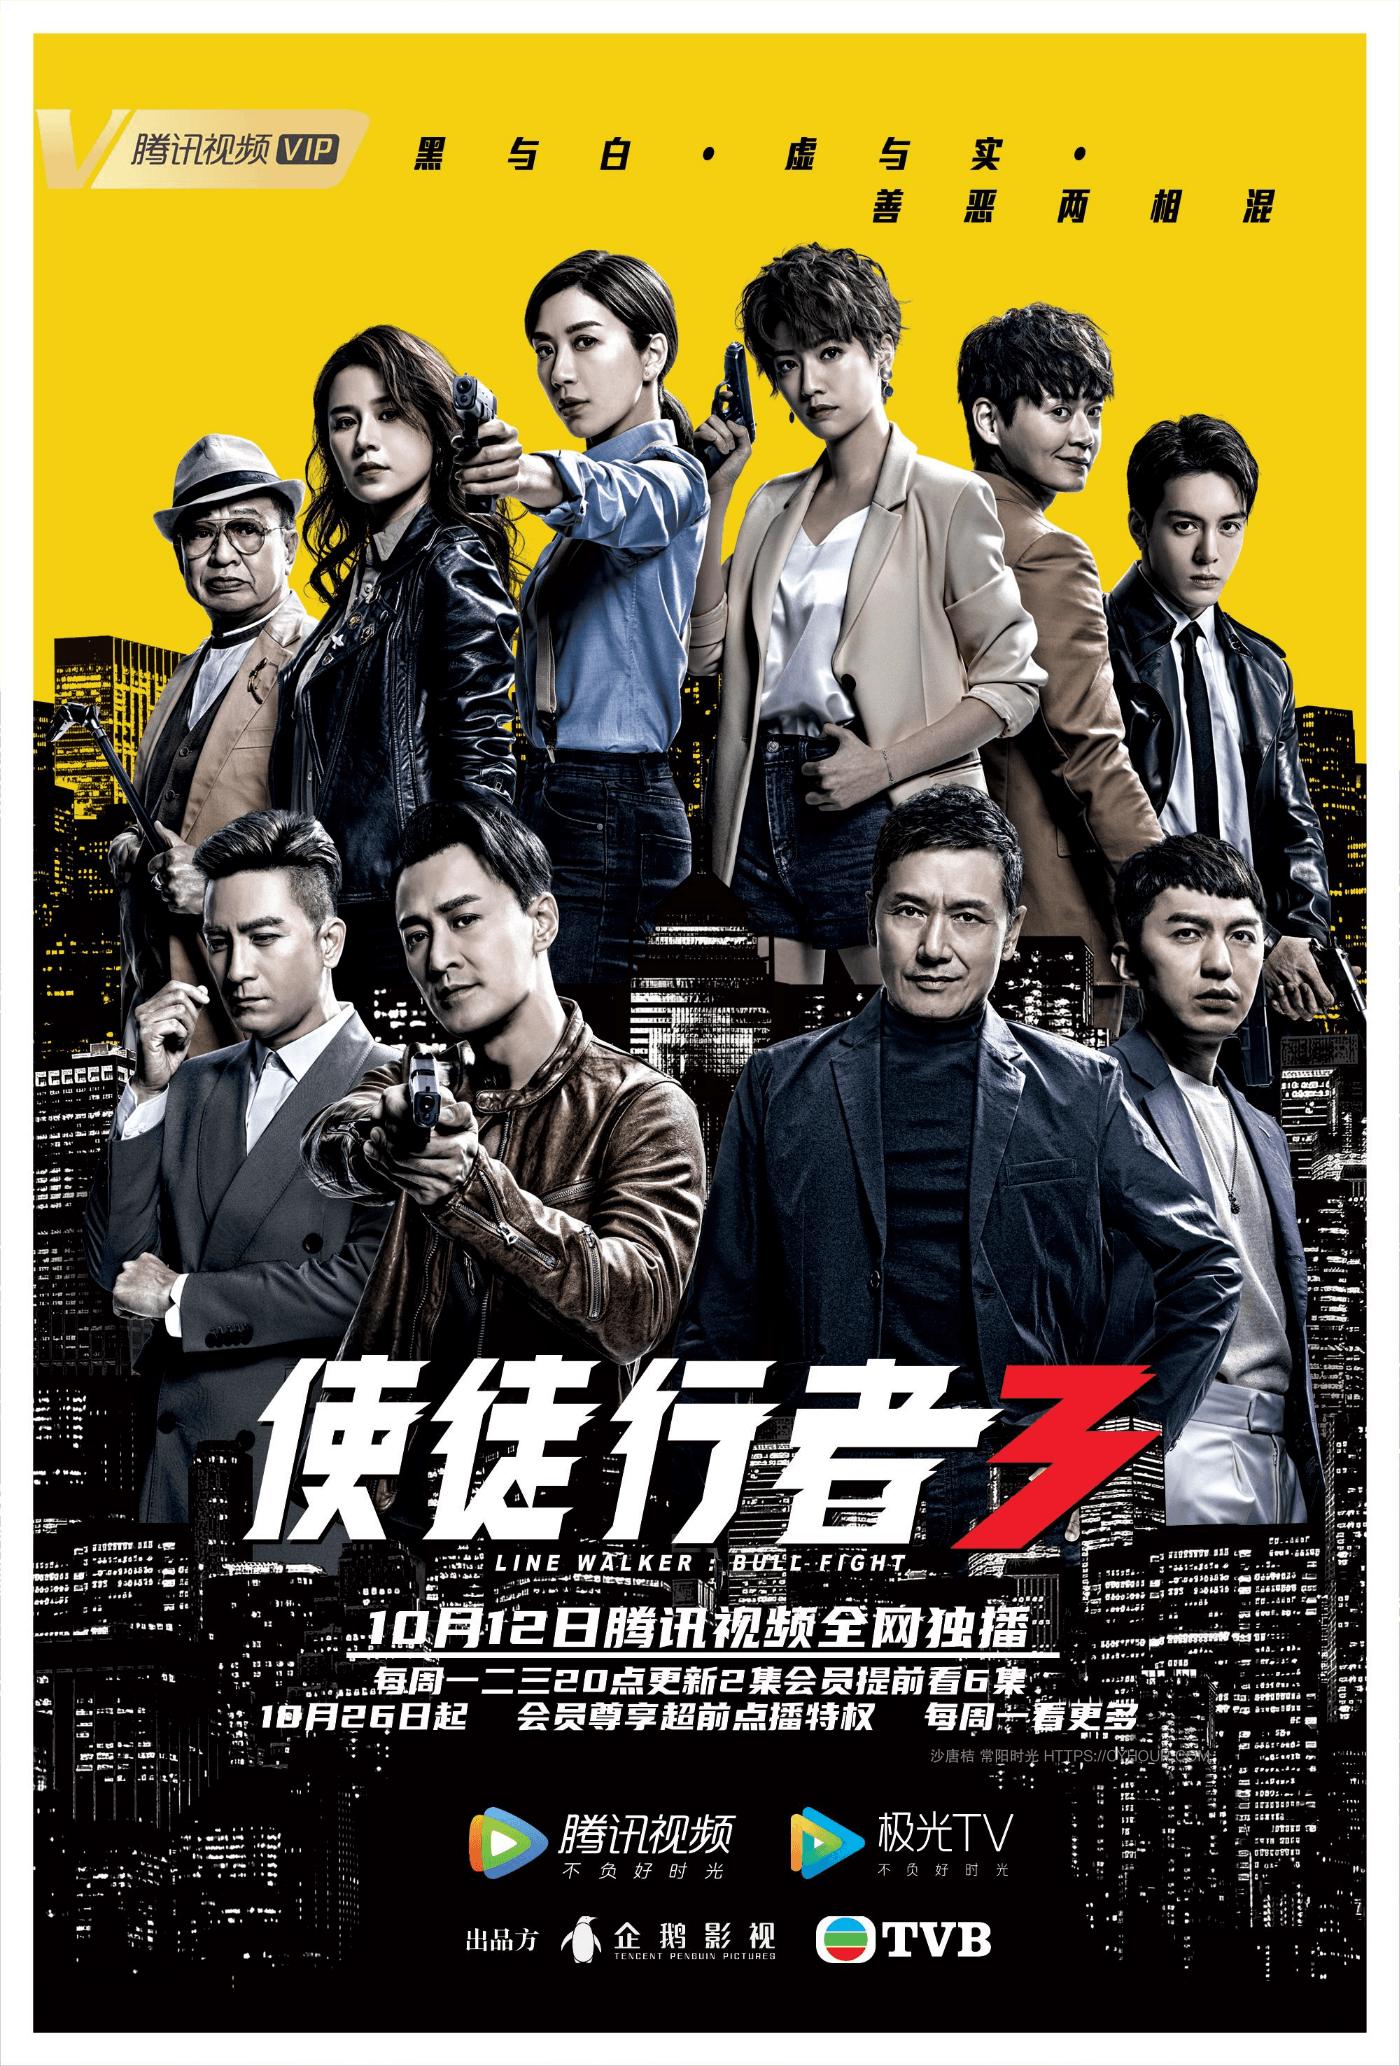 [TVB]使徒行者3 Line Walker 3.全37集1080P.国粤语中字 (2020)-垃圾站